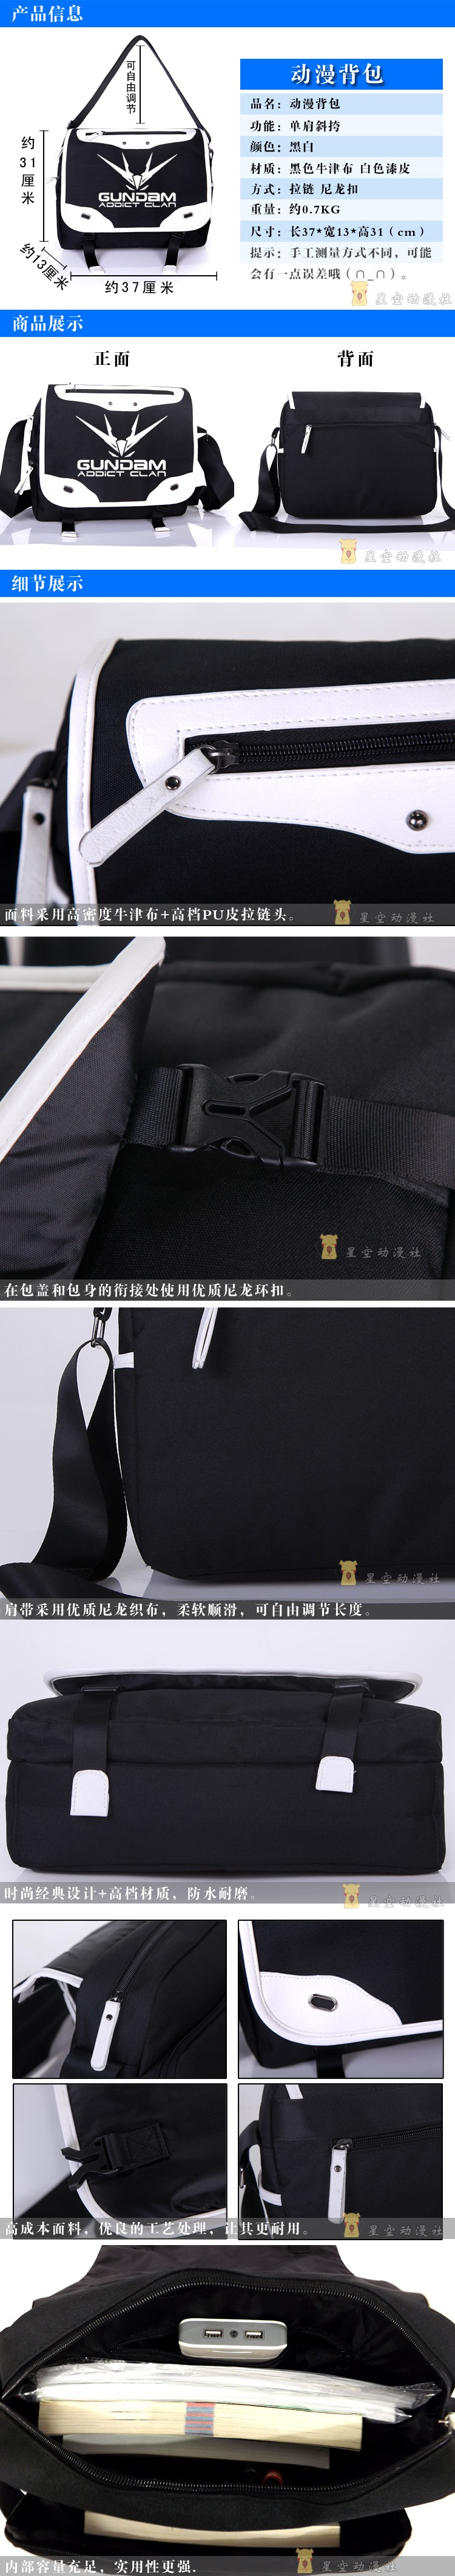 High Quality New Arrive Men Women Shoulder Messenger Bags GUNDAM Canvas Travel Bags Schoolbag